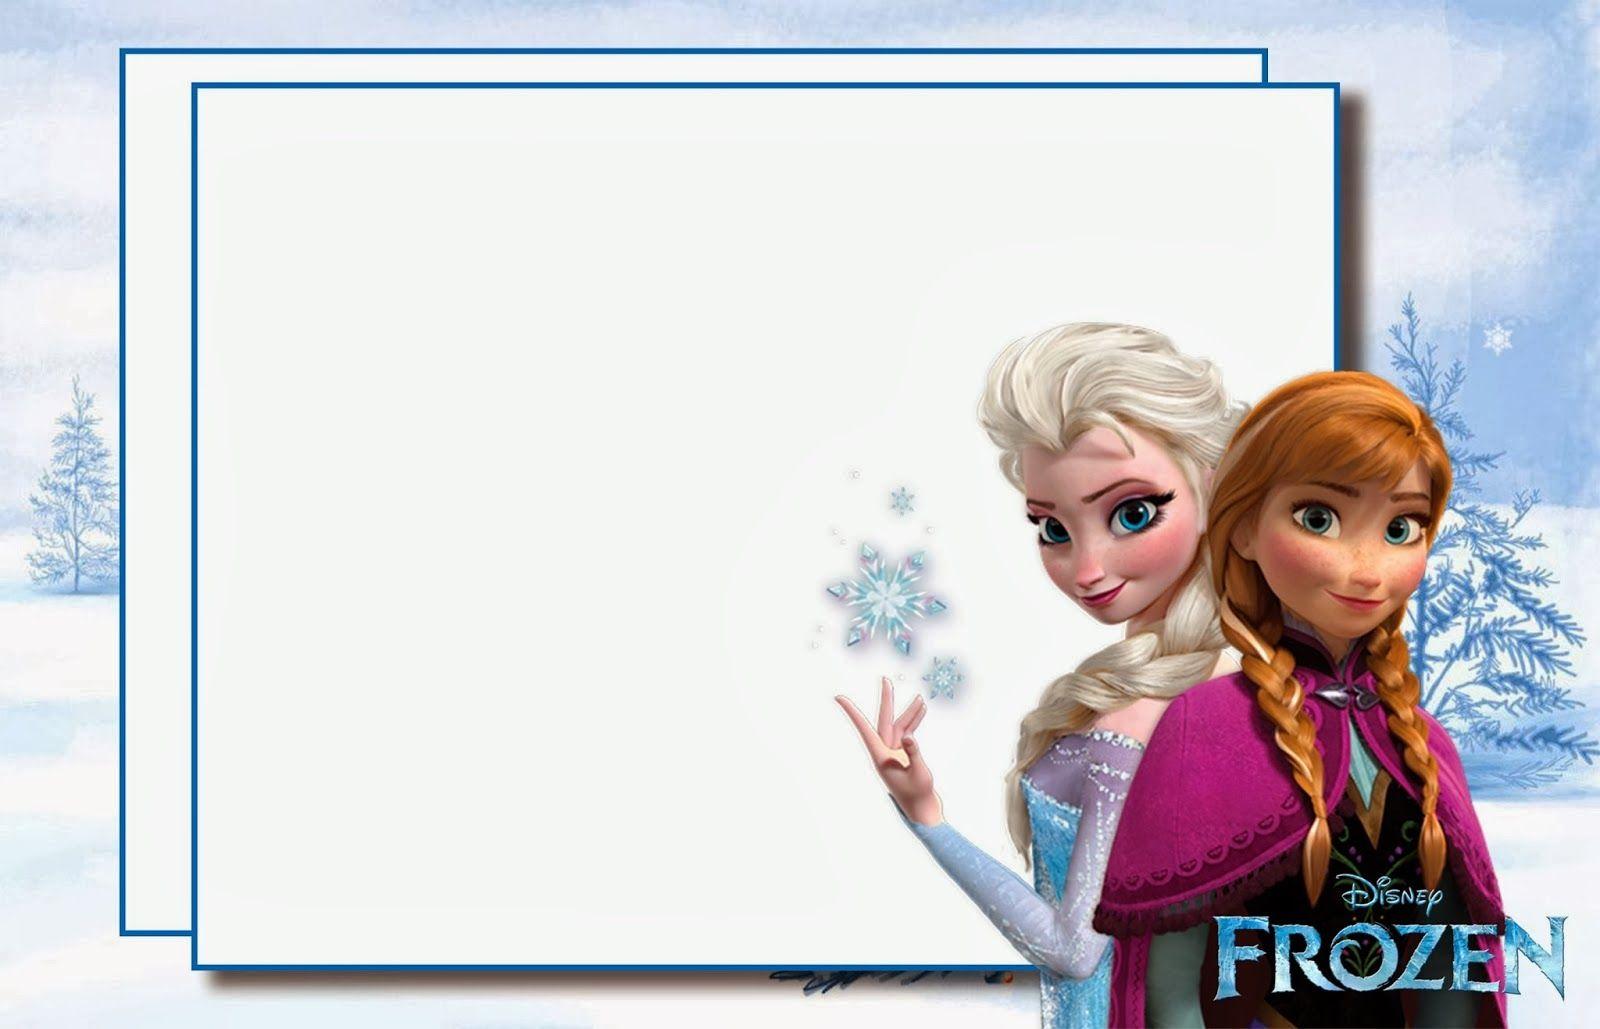 Frozen Party Free Printable Invitations Convite De Aniversario